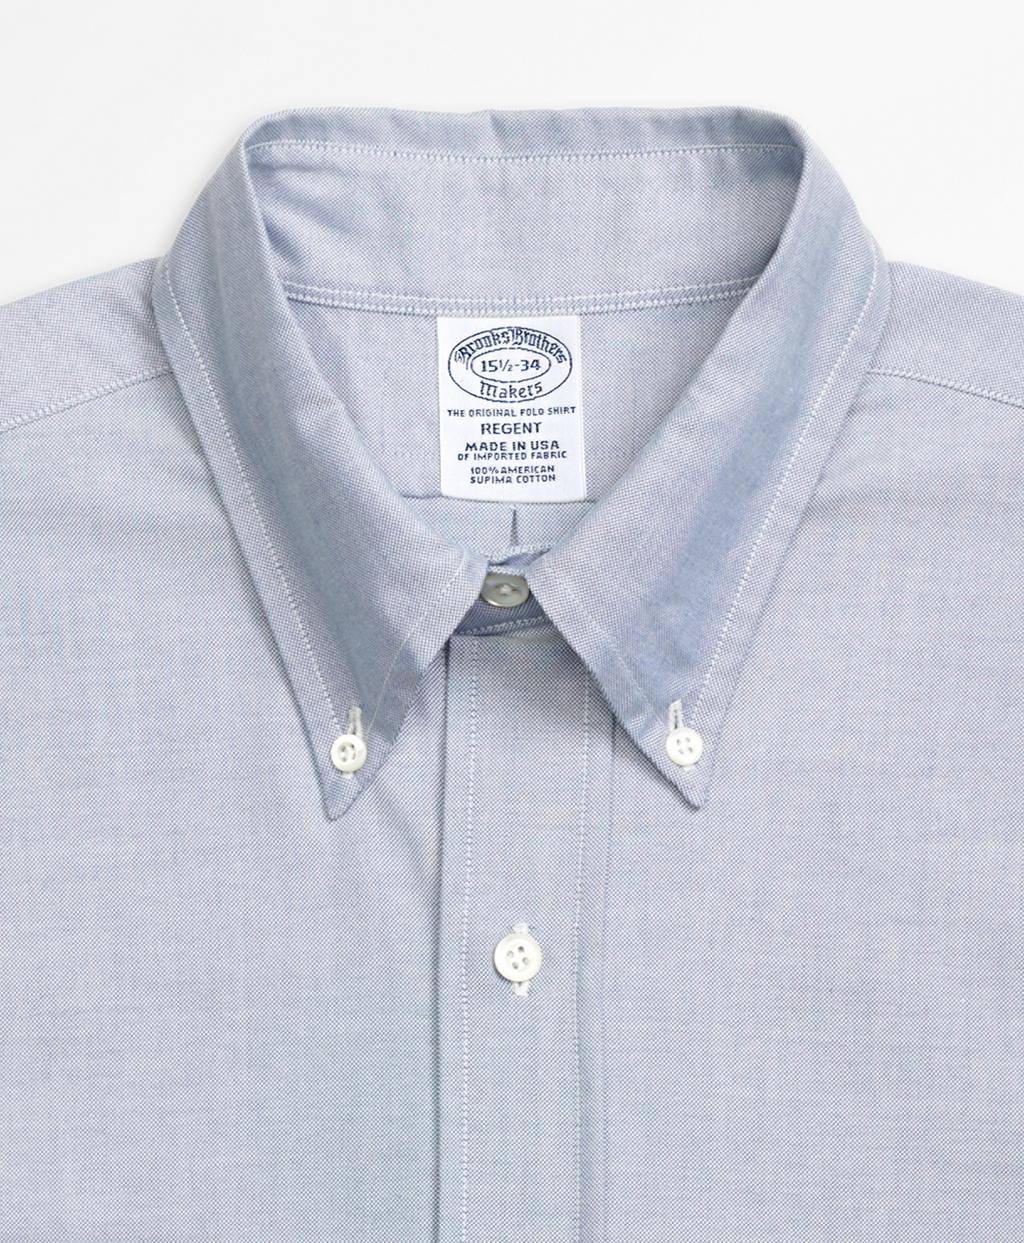 07b07de2 Original Polo® Button-Down Oxford Regent Fitted Dress Shirt - Brooks ...